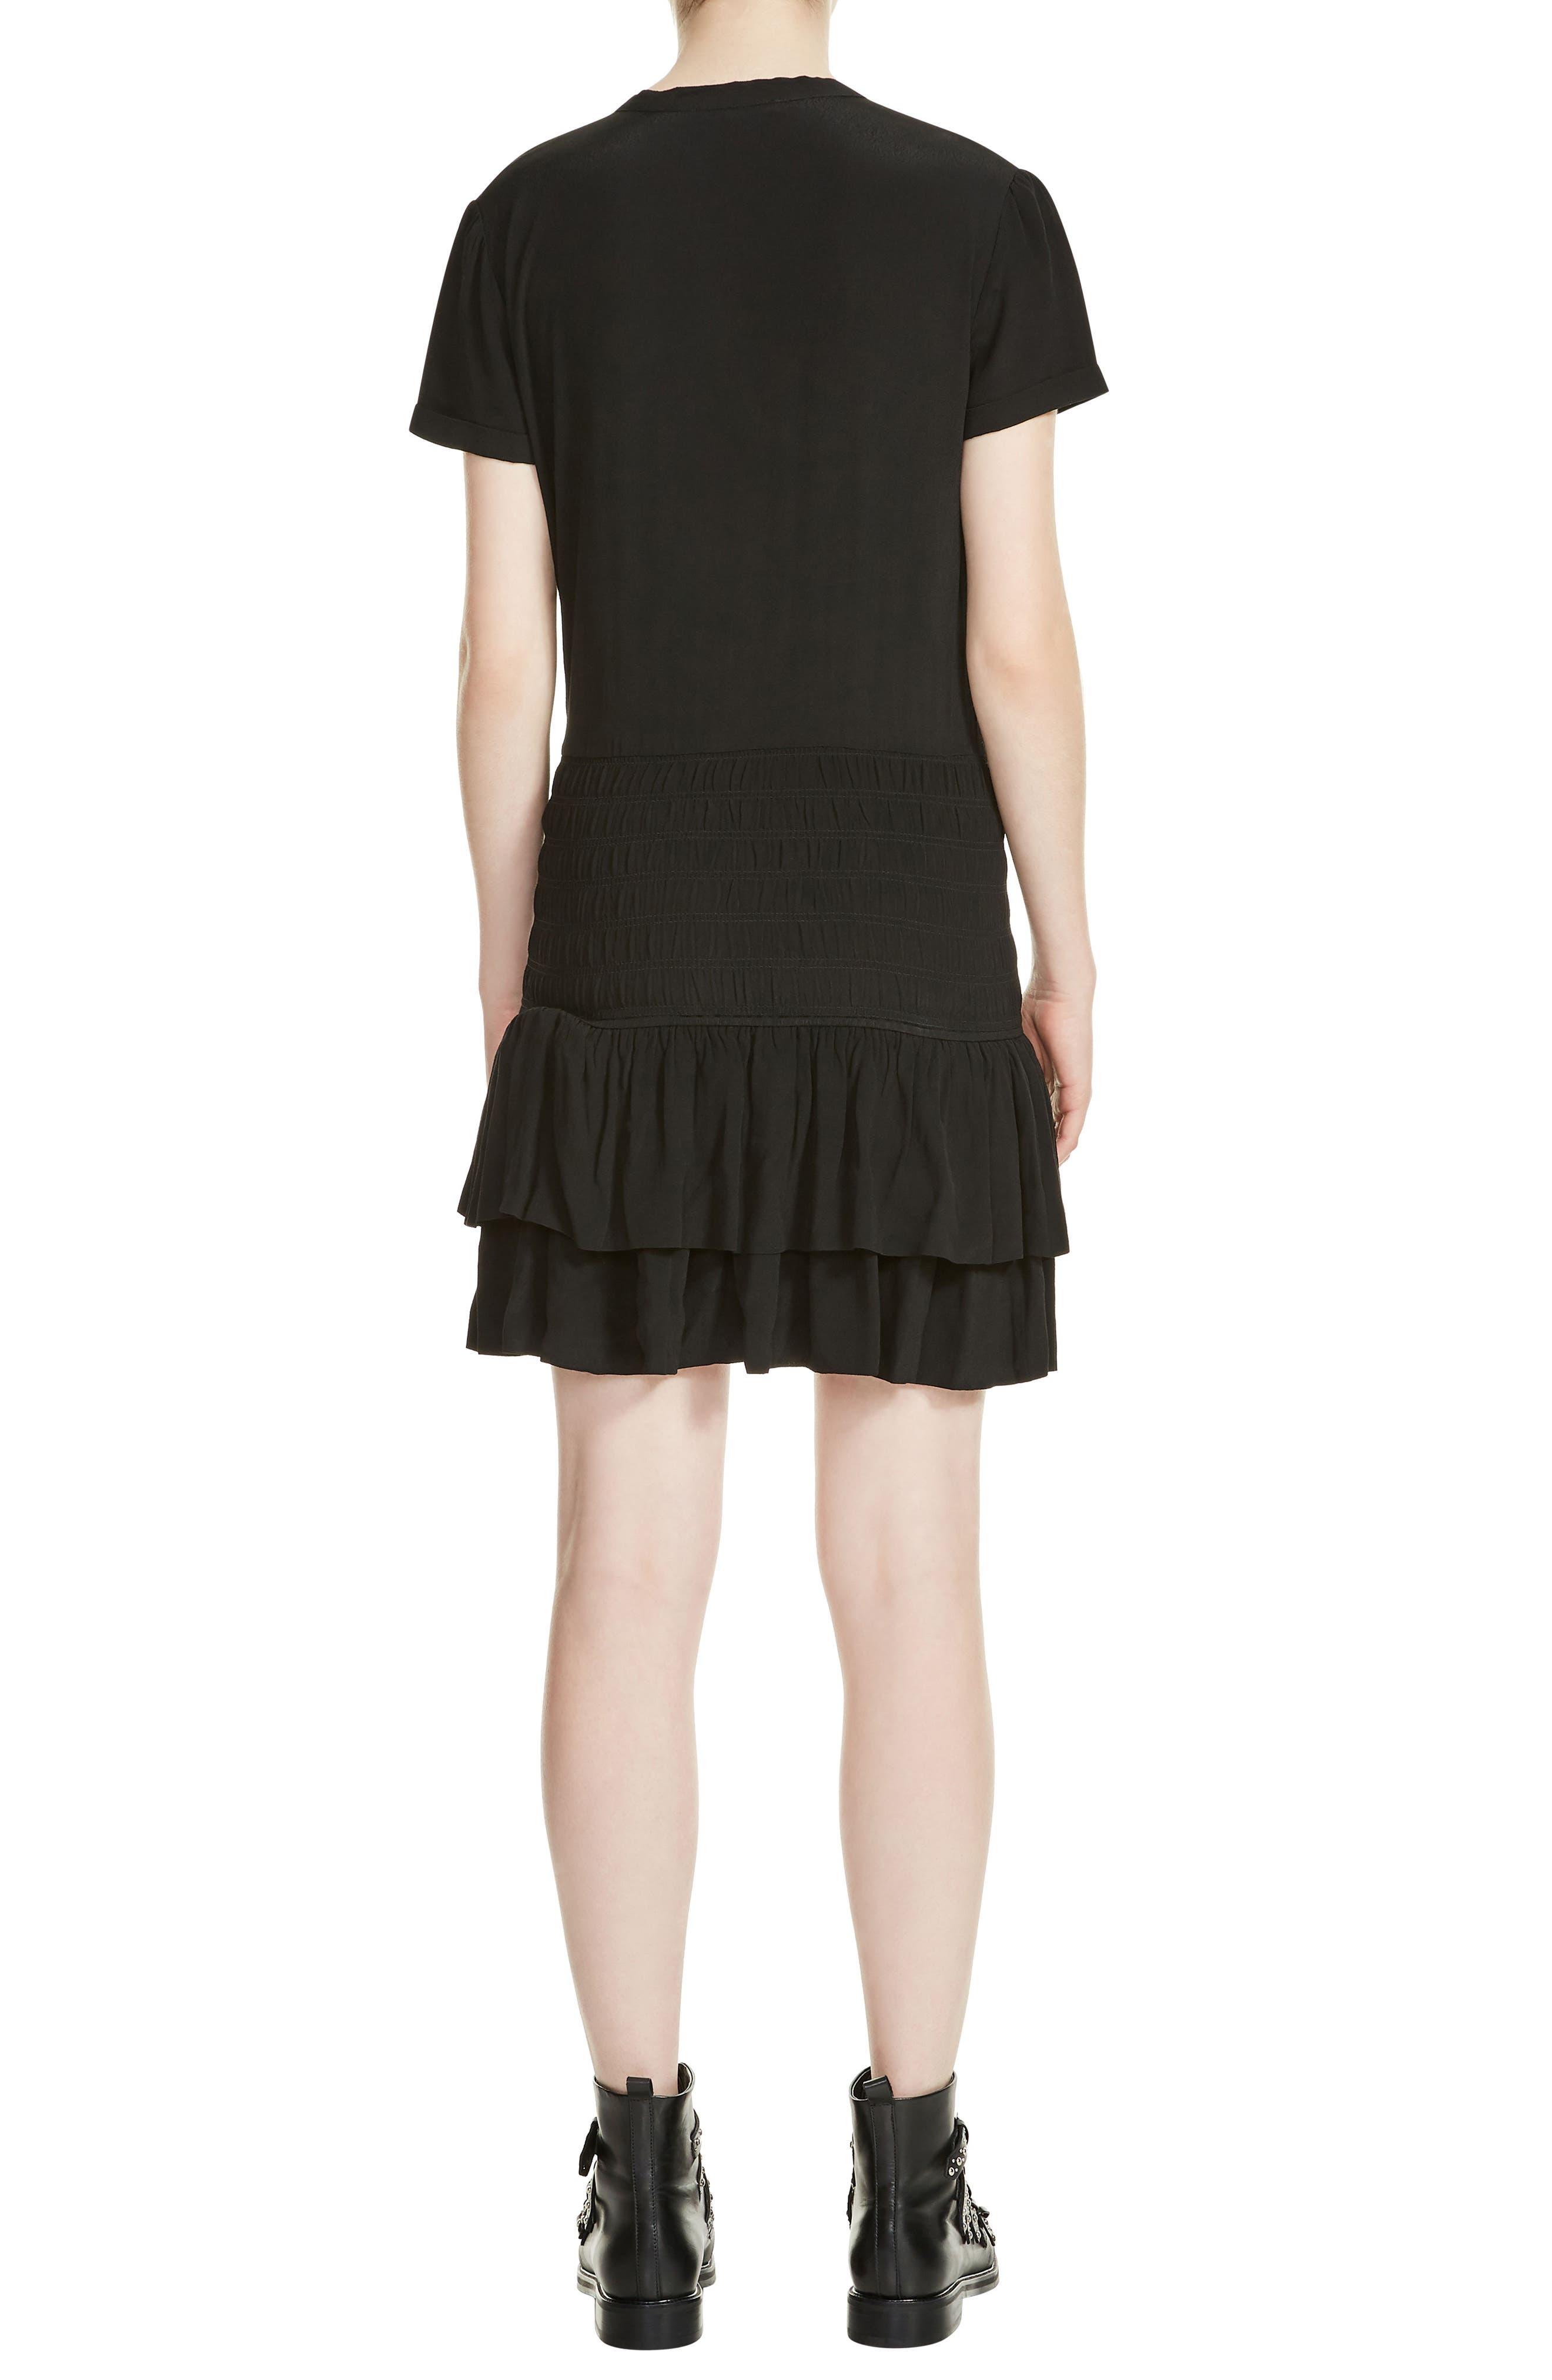 Raboa Smocked Dress,                             Alternate thumbnail 2, color,                             Black